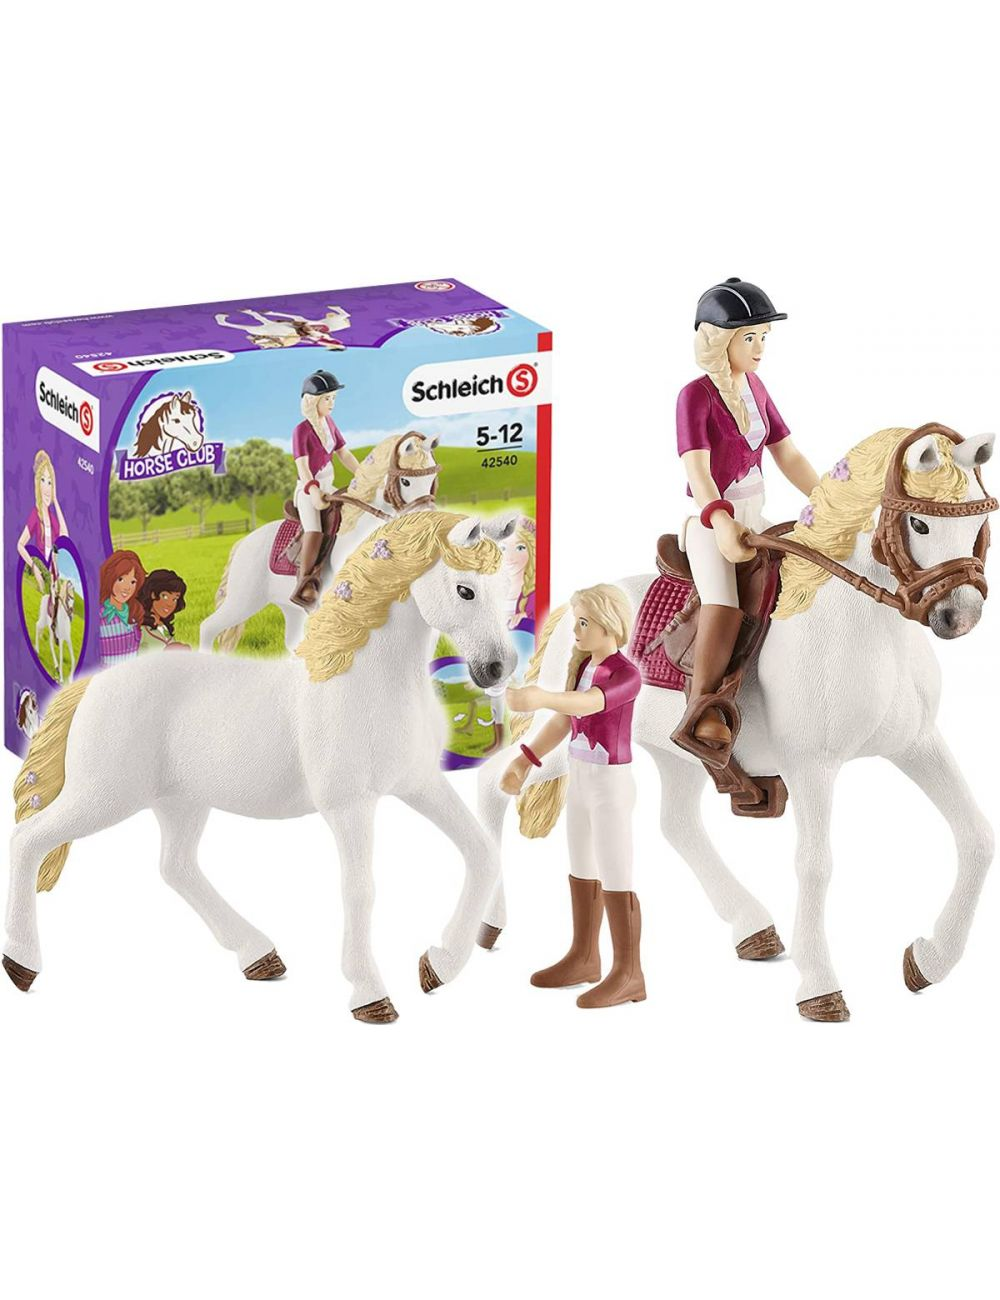 Schleich 42540 Sofia & Blossom Horse Club Jeździec Koń Figurka